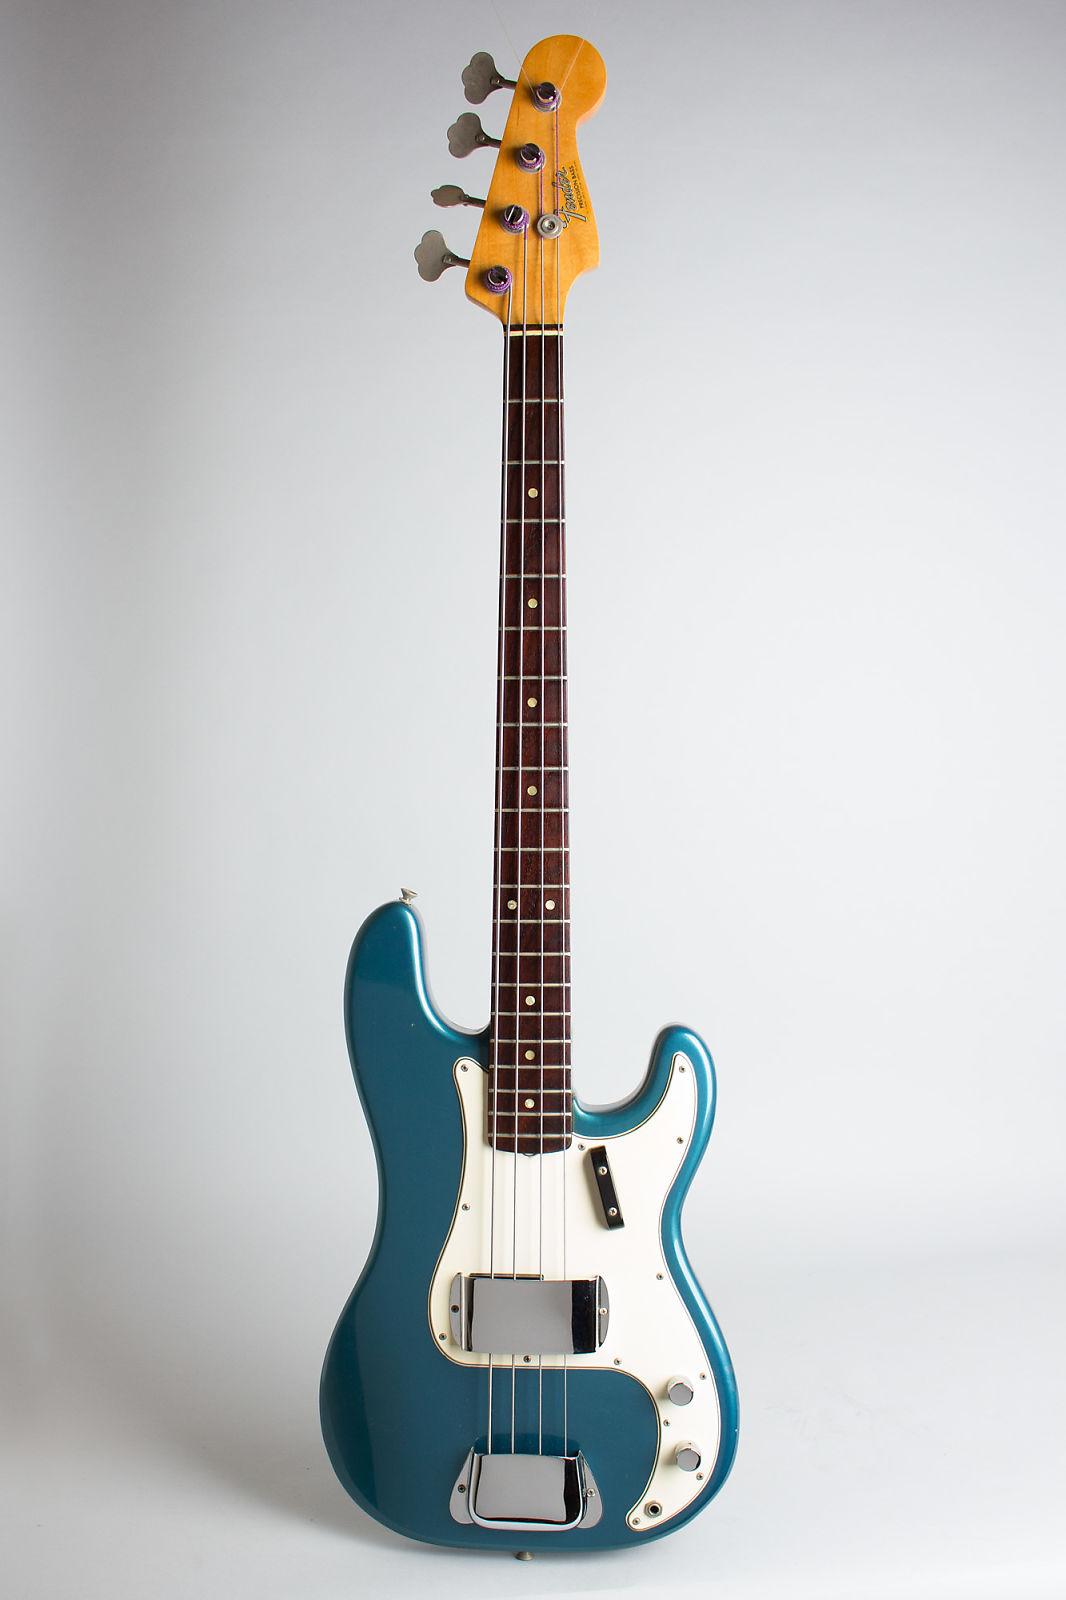 Fender  Precision Bass Solid Body Electric Bass Guitar (1966), ser. #150842, original black hard shell case.